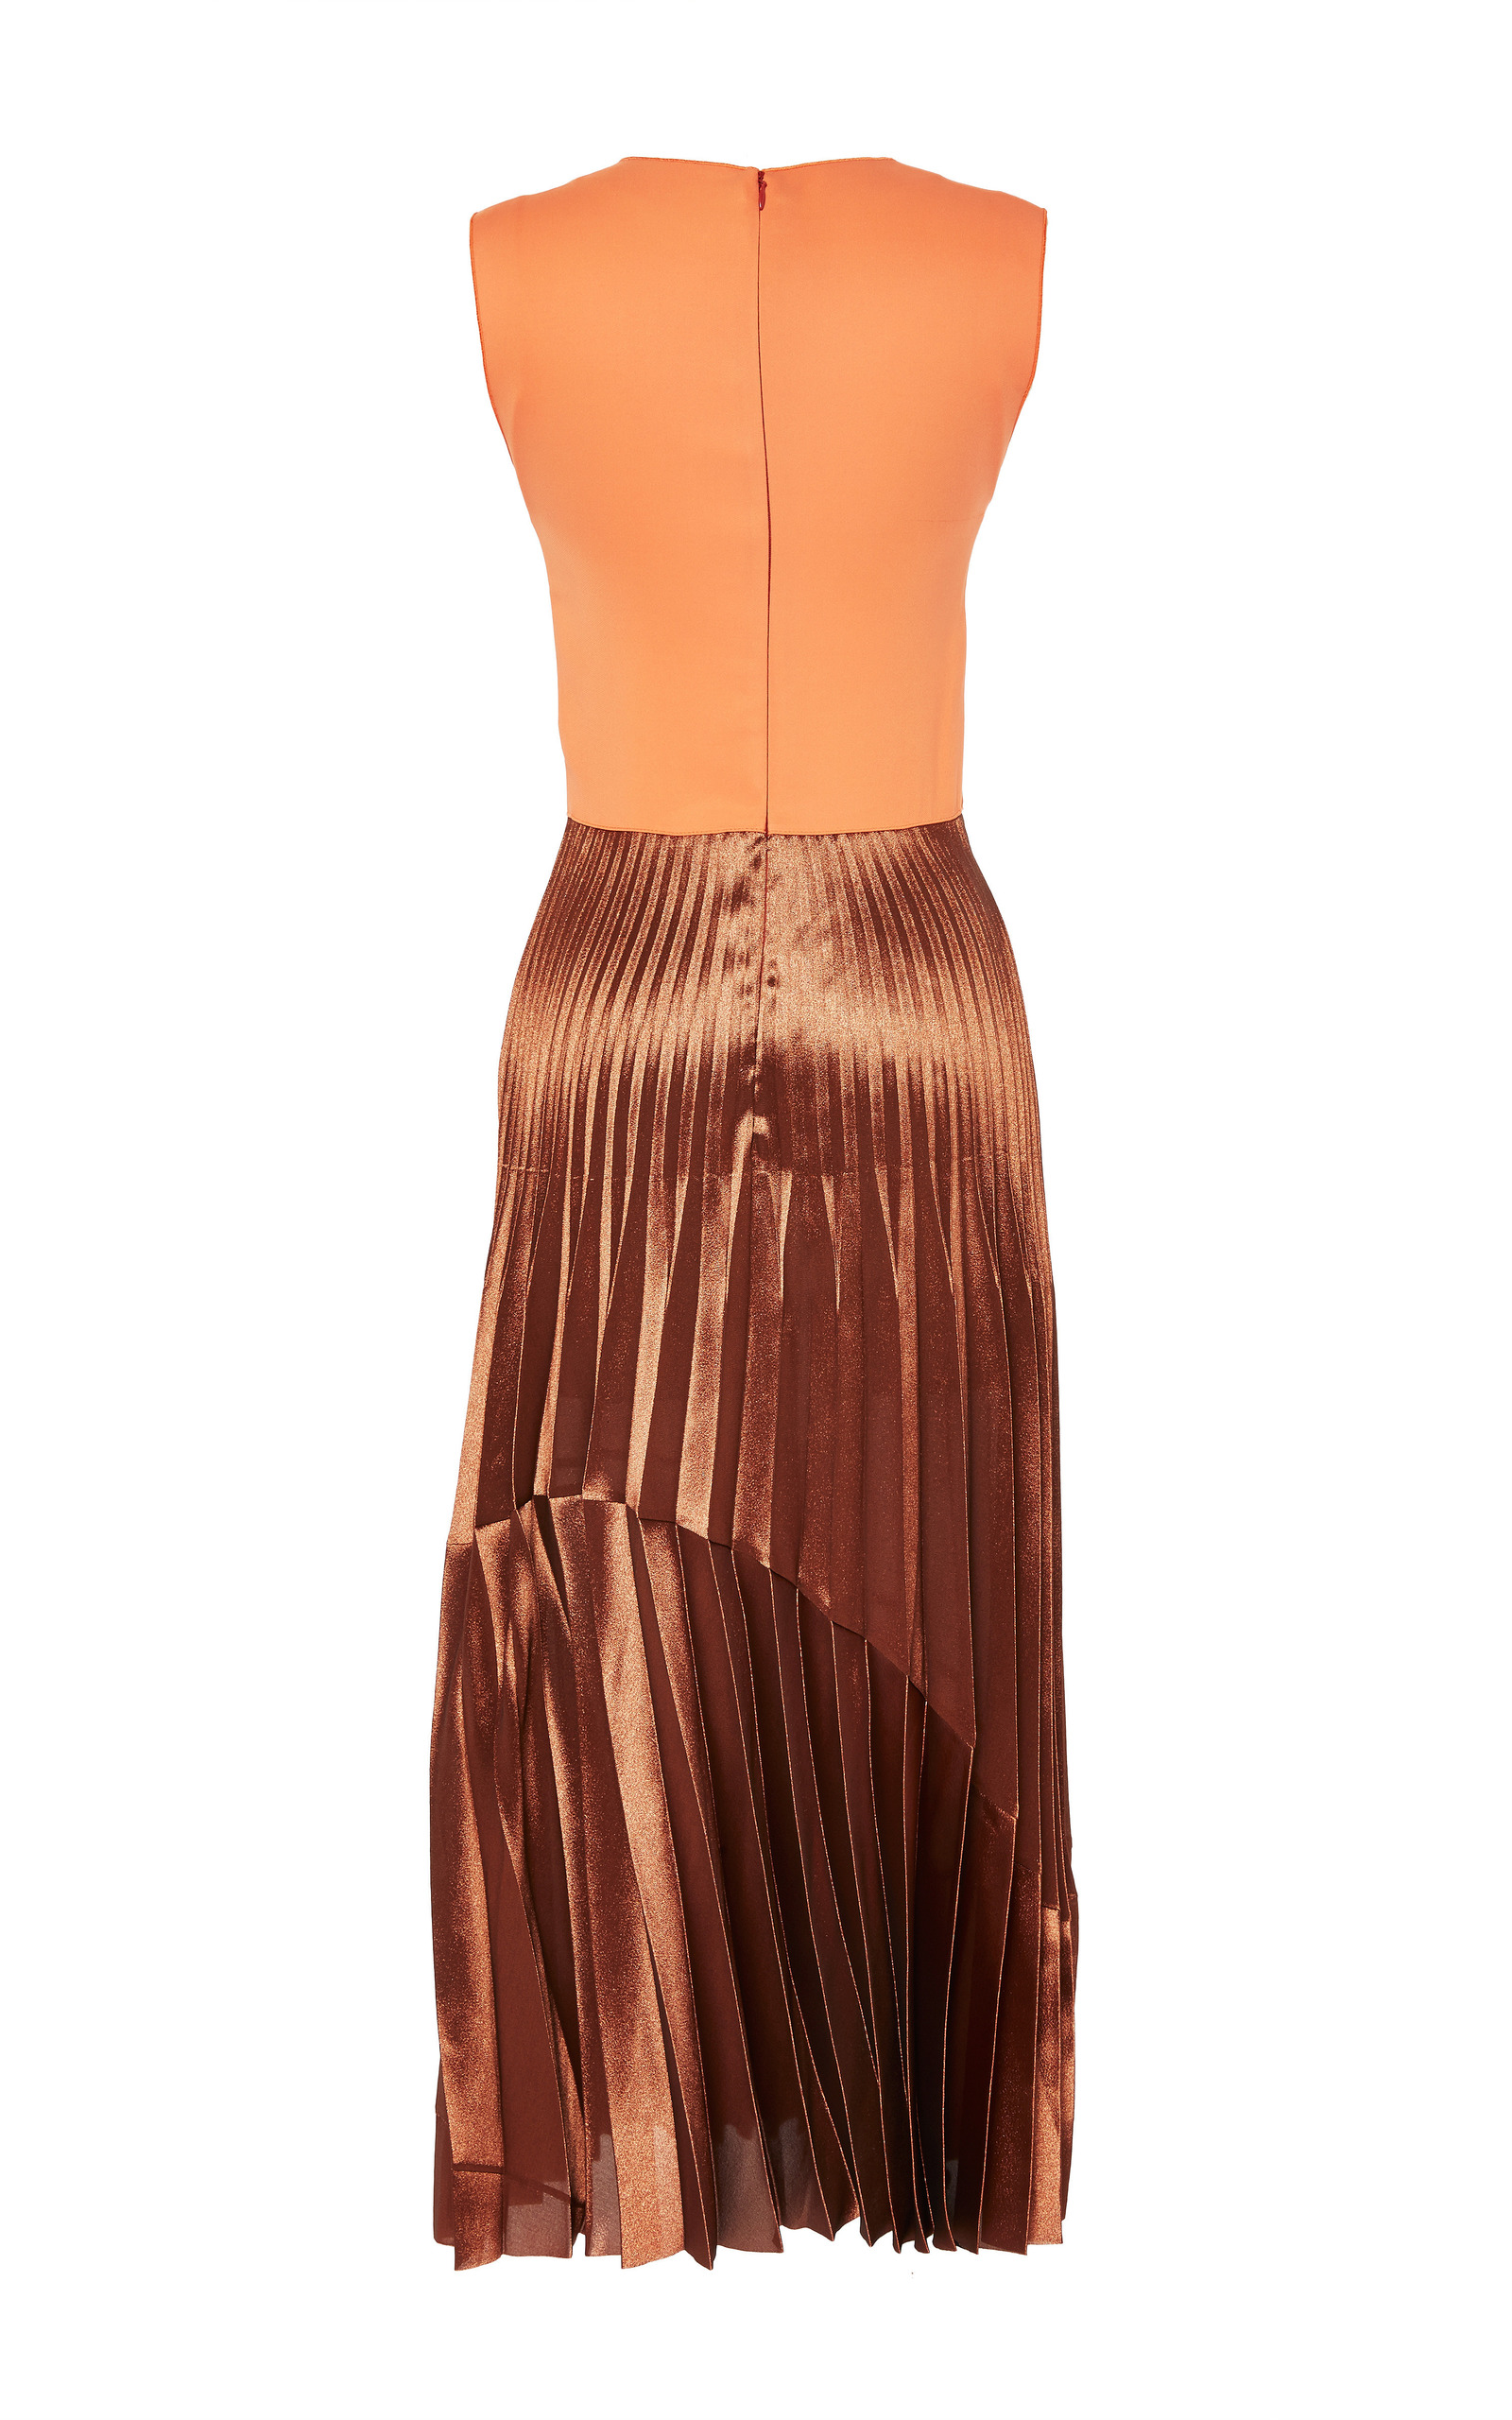 faecda68d2 Tangerine Dress With Bronze Pleated Skirt by Barbara